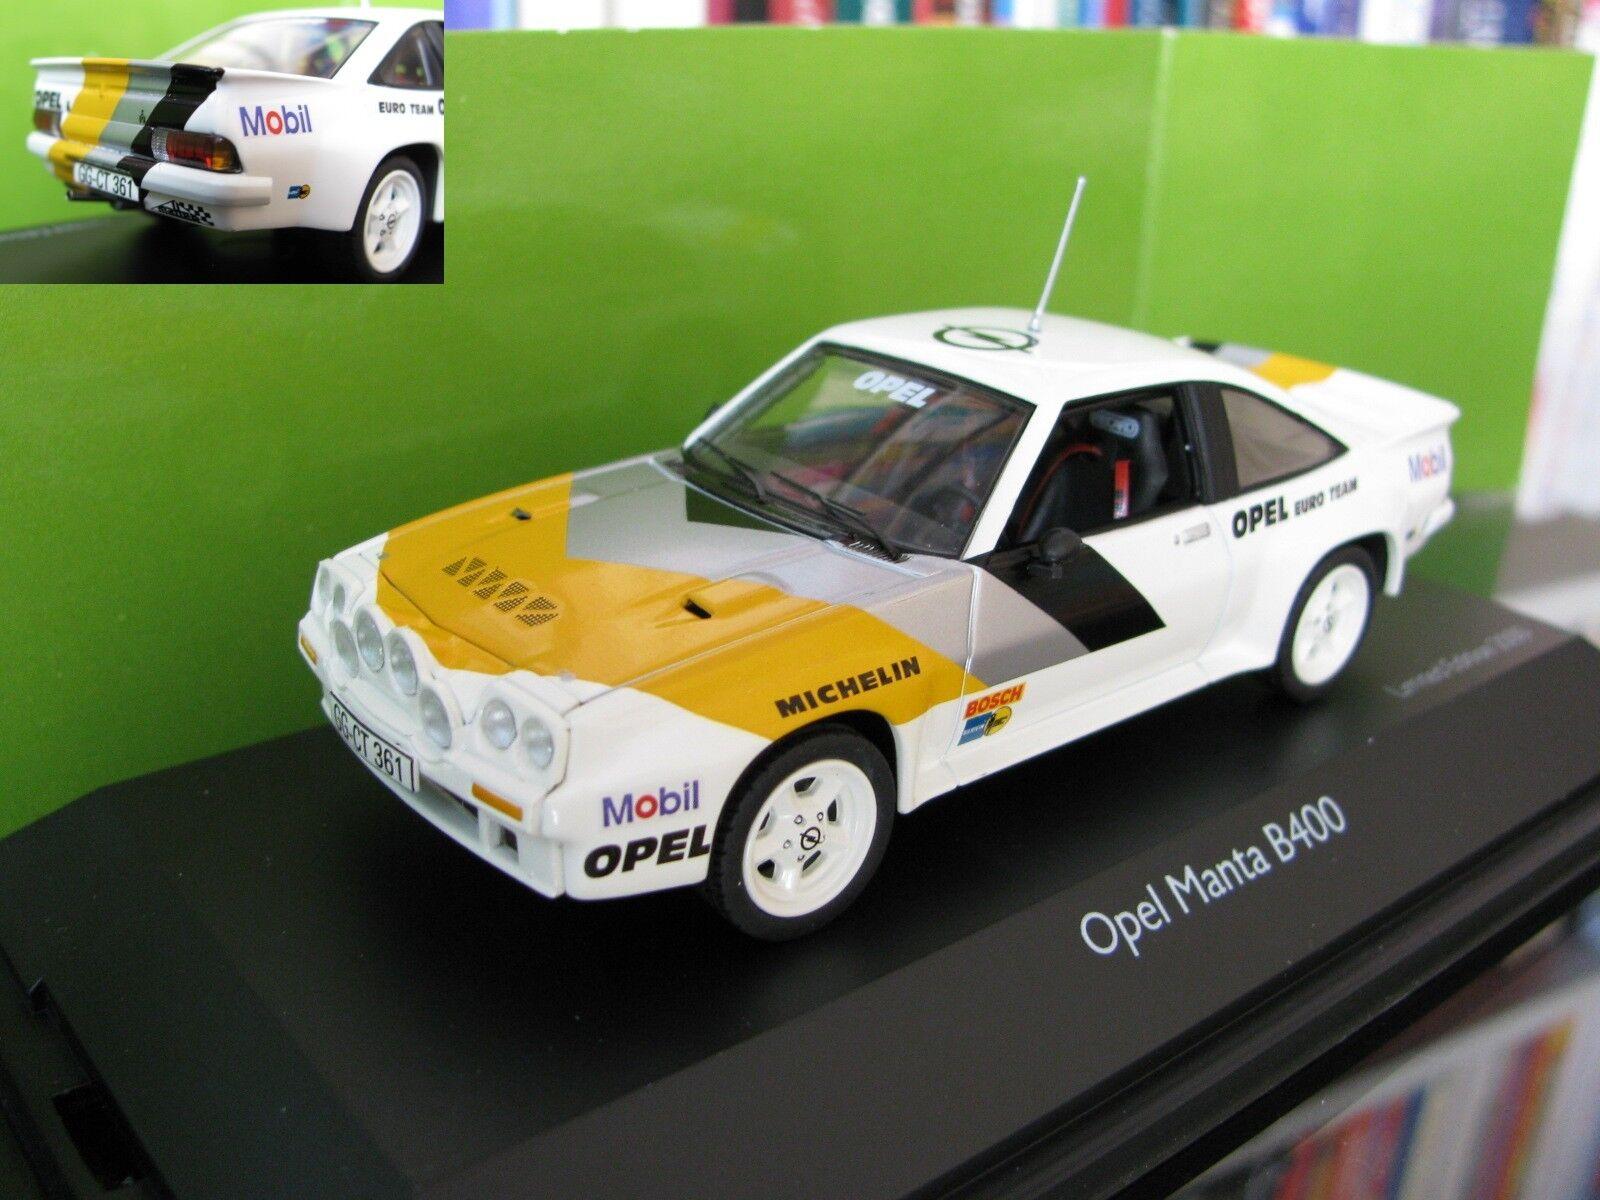 1/43 Schuco Opel Manta B400 Rallye diecast